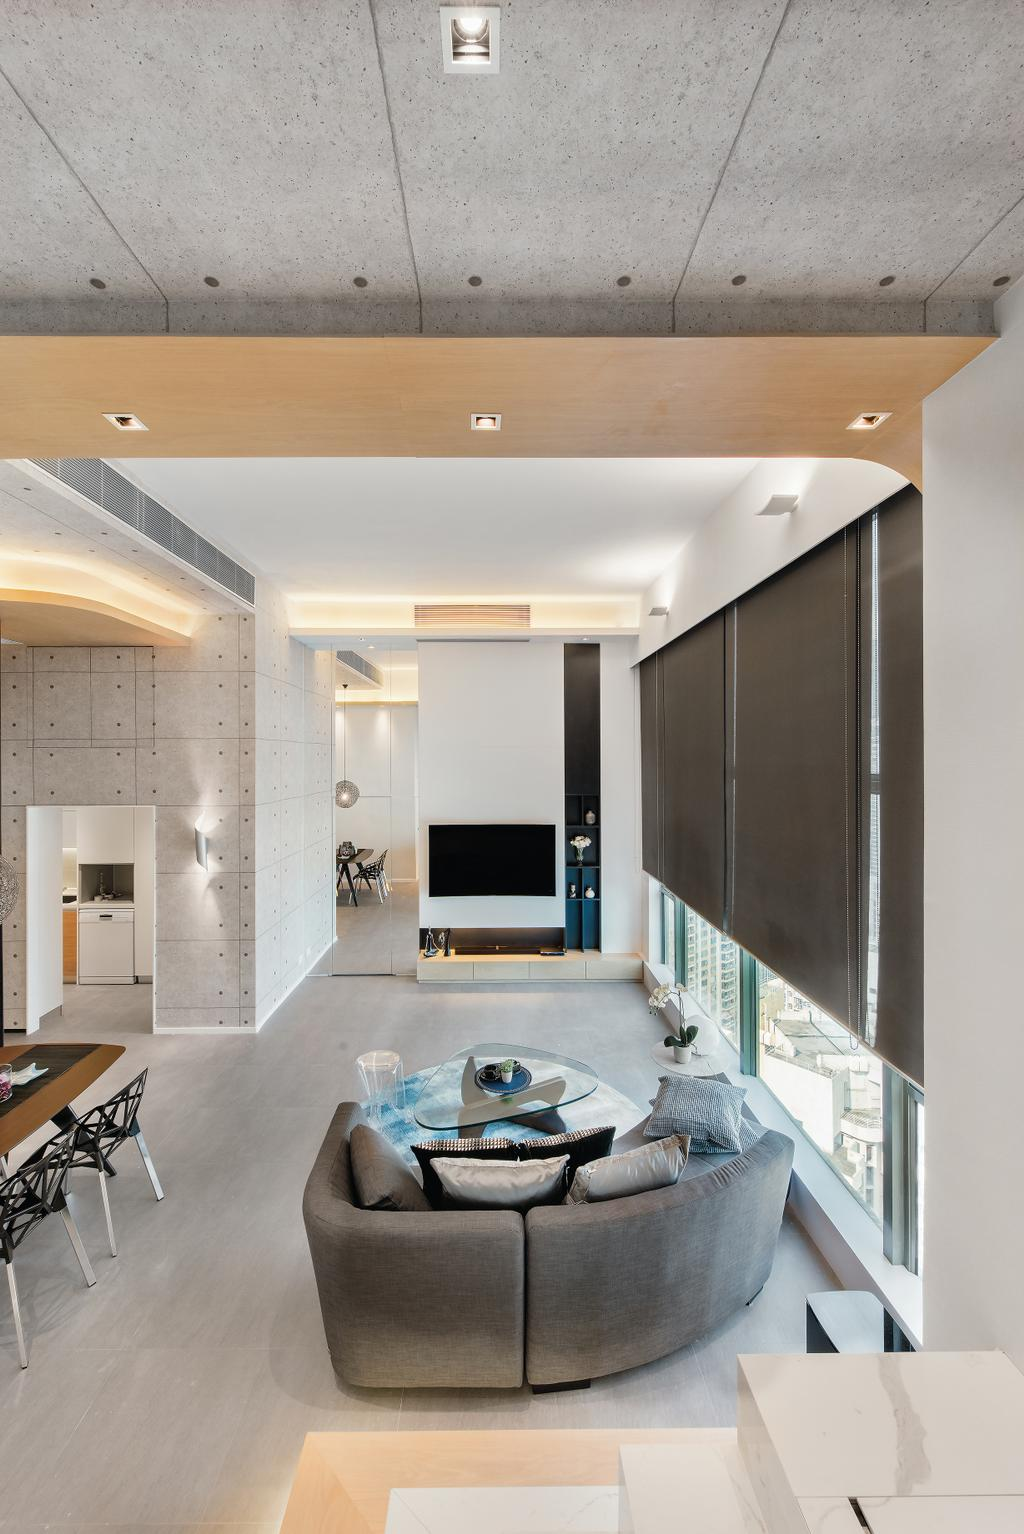 摩登, 私家樓, 九龍西, 室內設計師, 畫斯室內設計, 工業, Indoors, Interior Design, Electronics, Entertainment Center